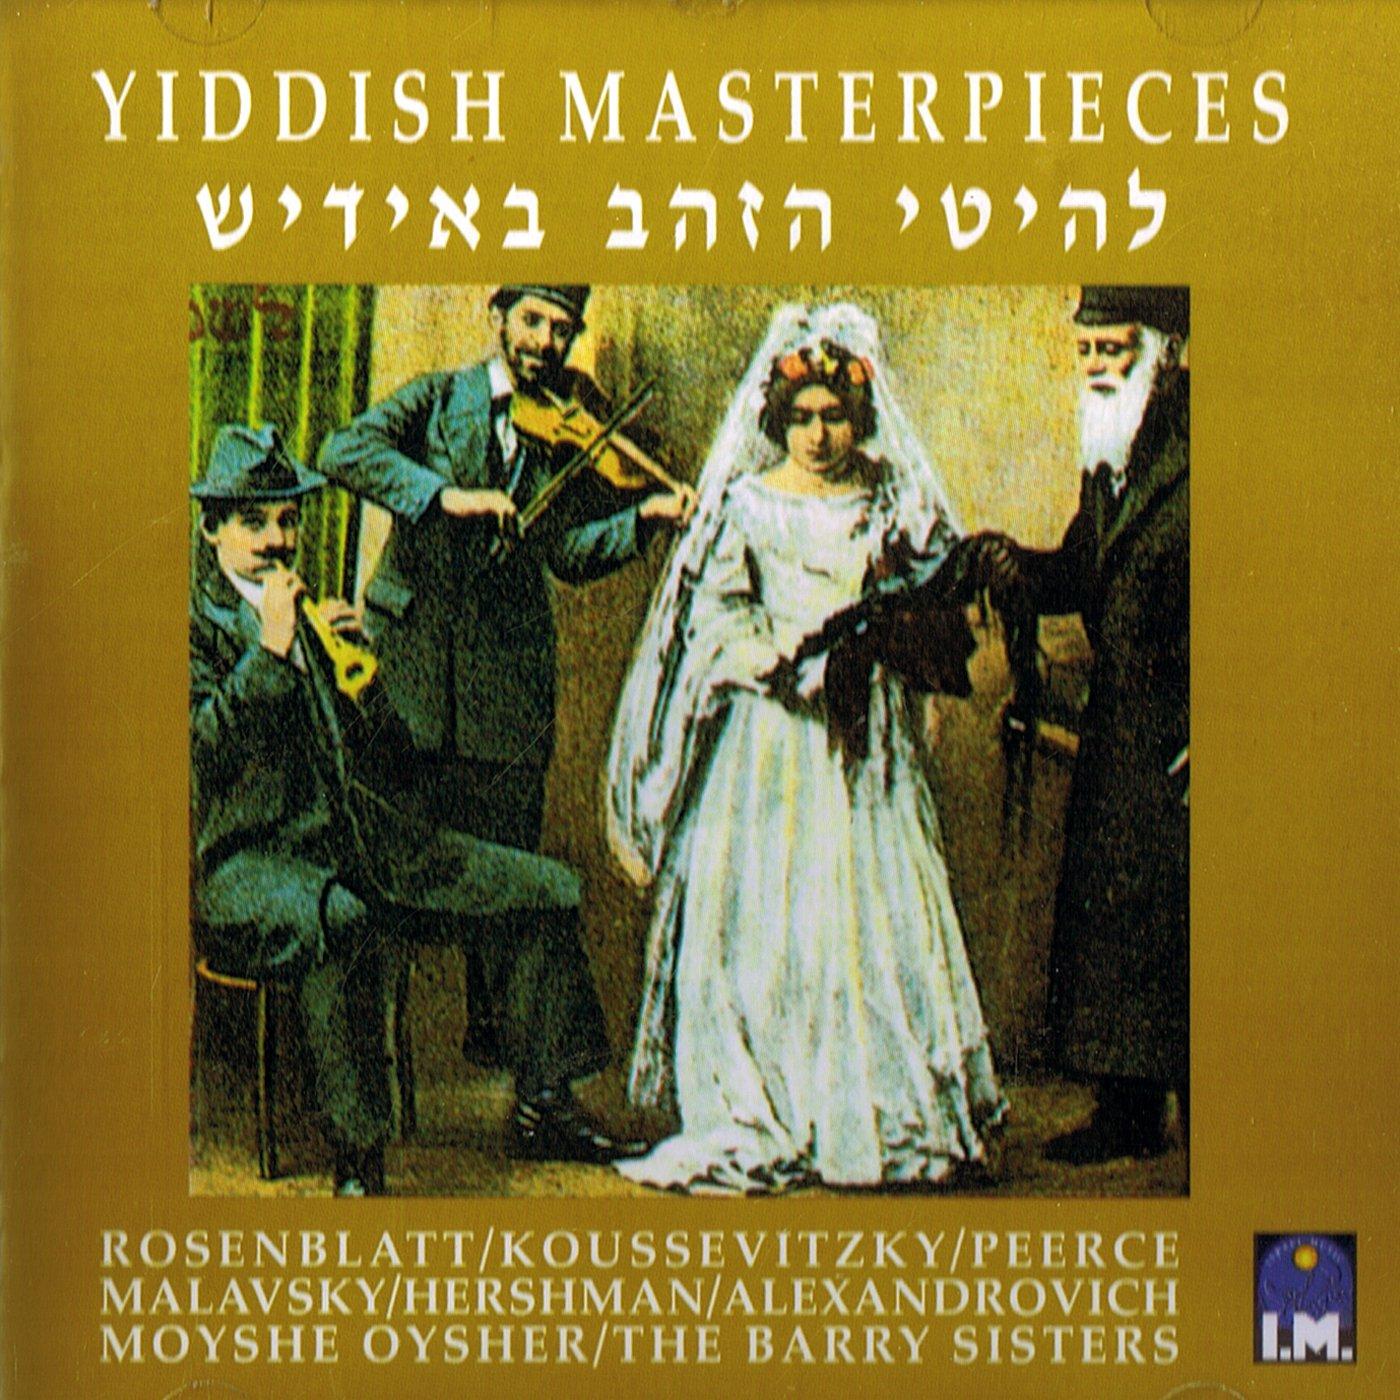 Yiddish Masterpieces 2 Las Vegas Mall Vol. safety